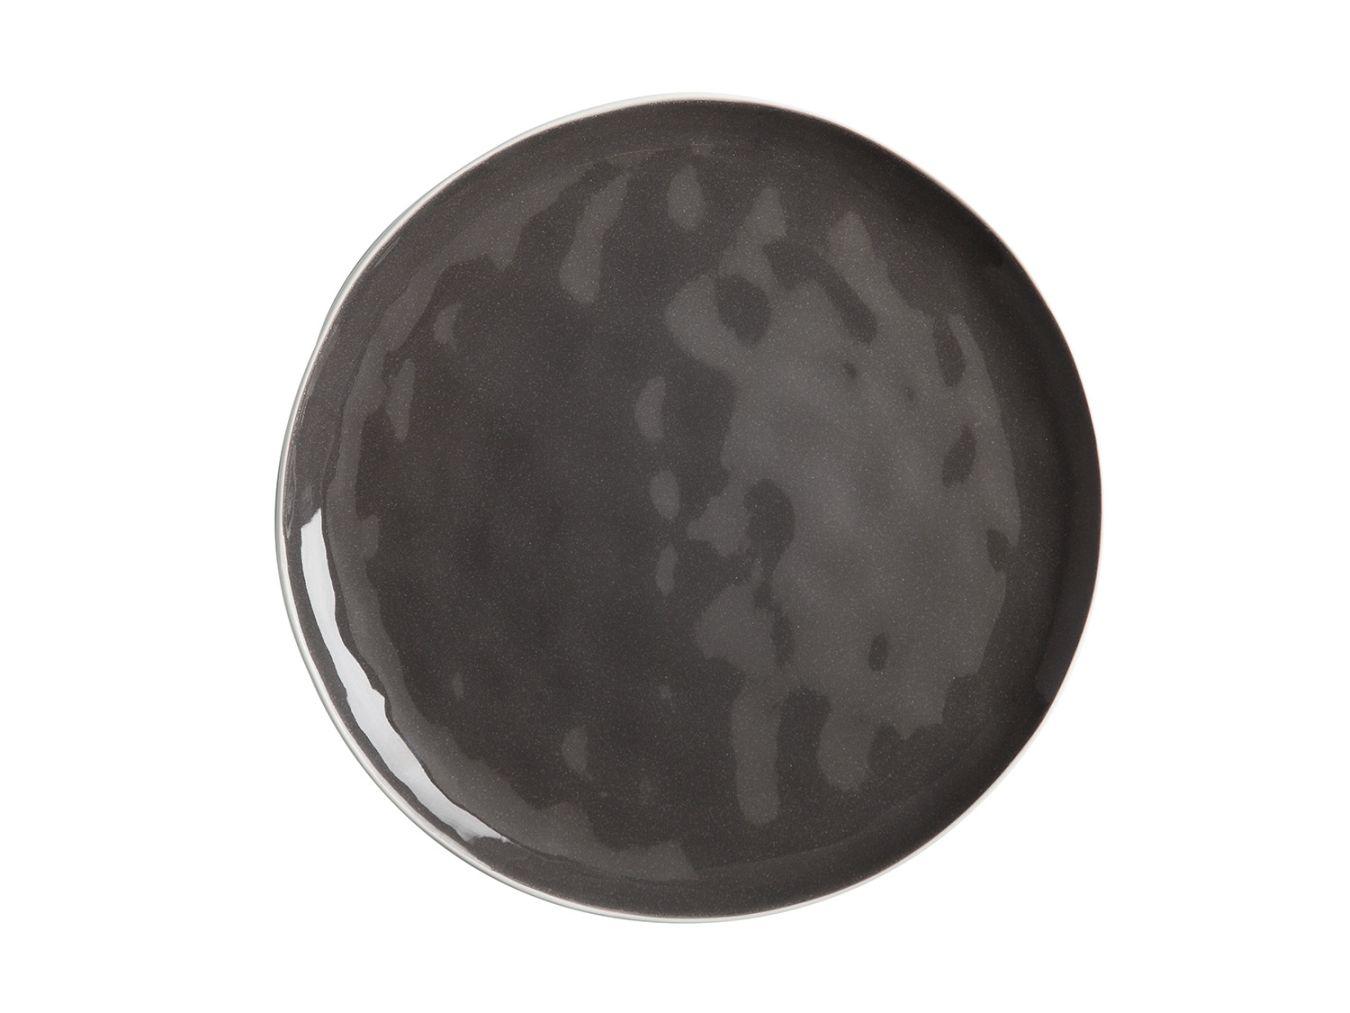 Kameninový podnos WAYFARER 33 cm - Maxwell&Williams